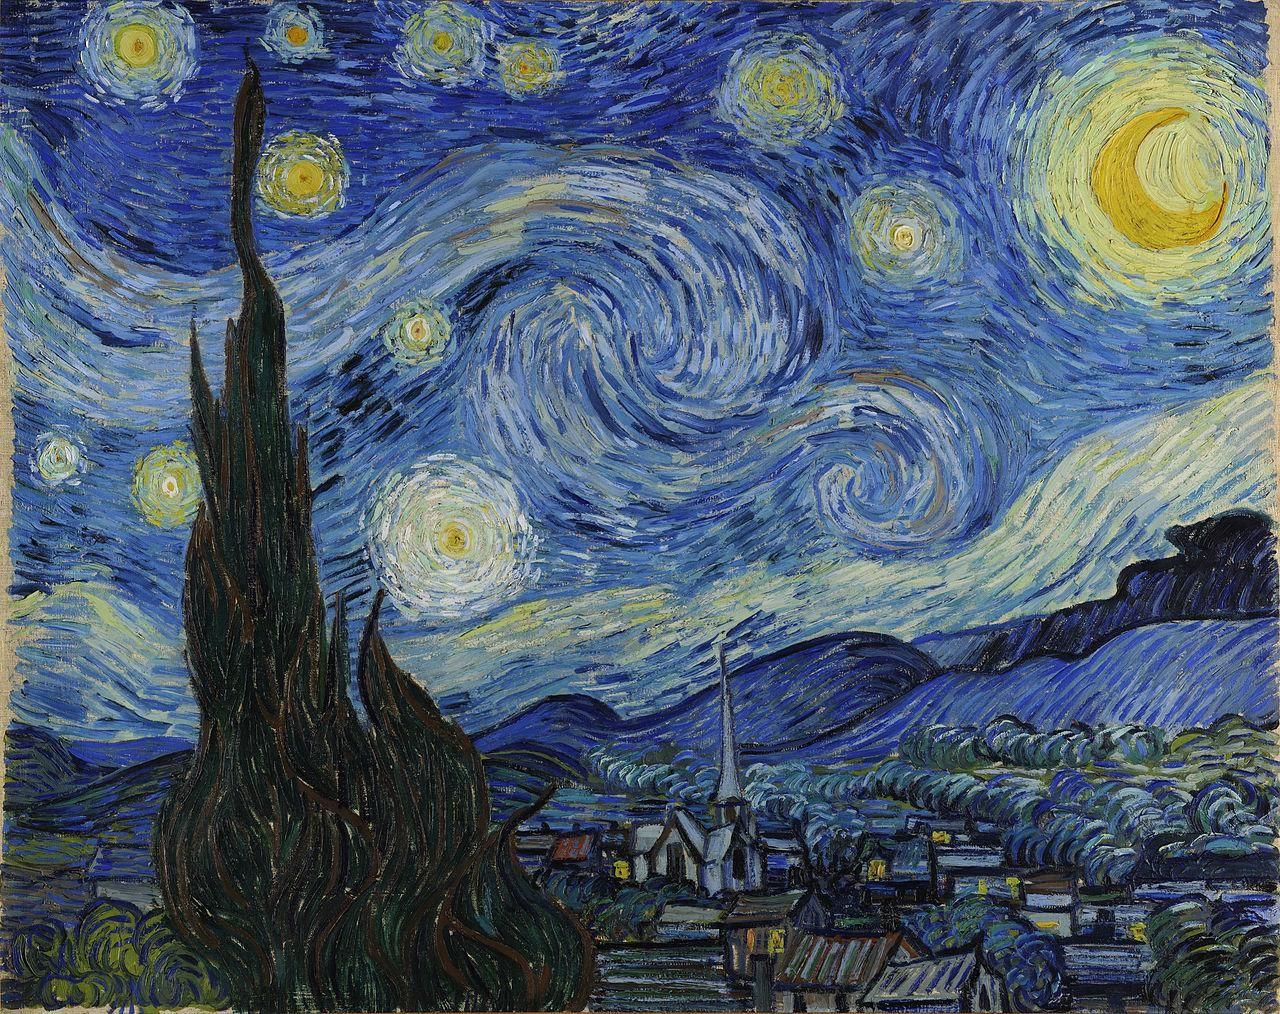 Abstract 19th Century Artist - 00cf890ea515b54e054e3b241380bdac_Good Abstract 19th Century Artist - 00cf890ea515b54e054e3b241380bdac  Perfect Image Reference_124730.jpg